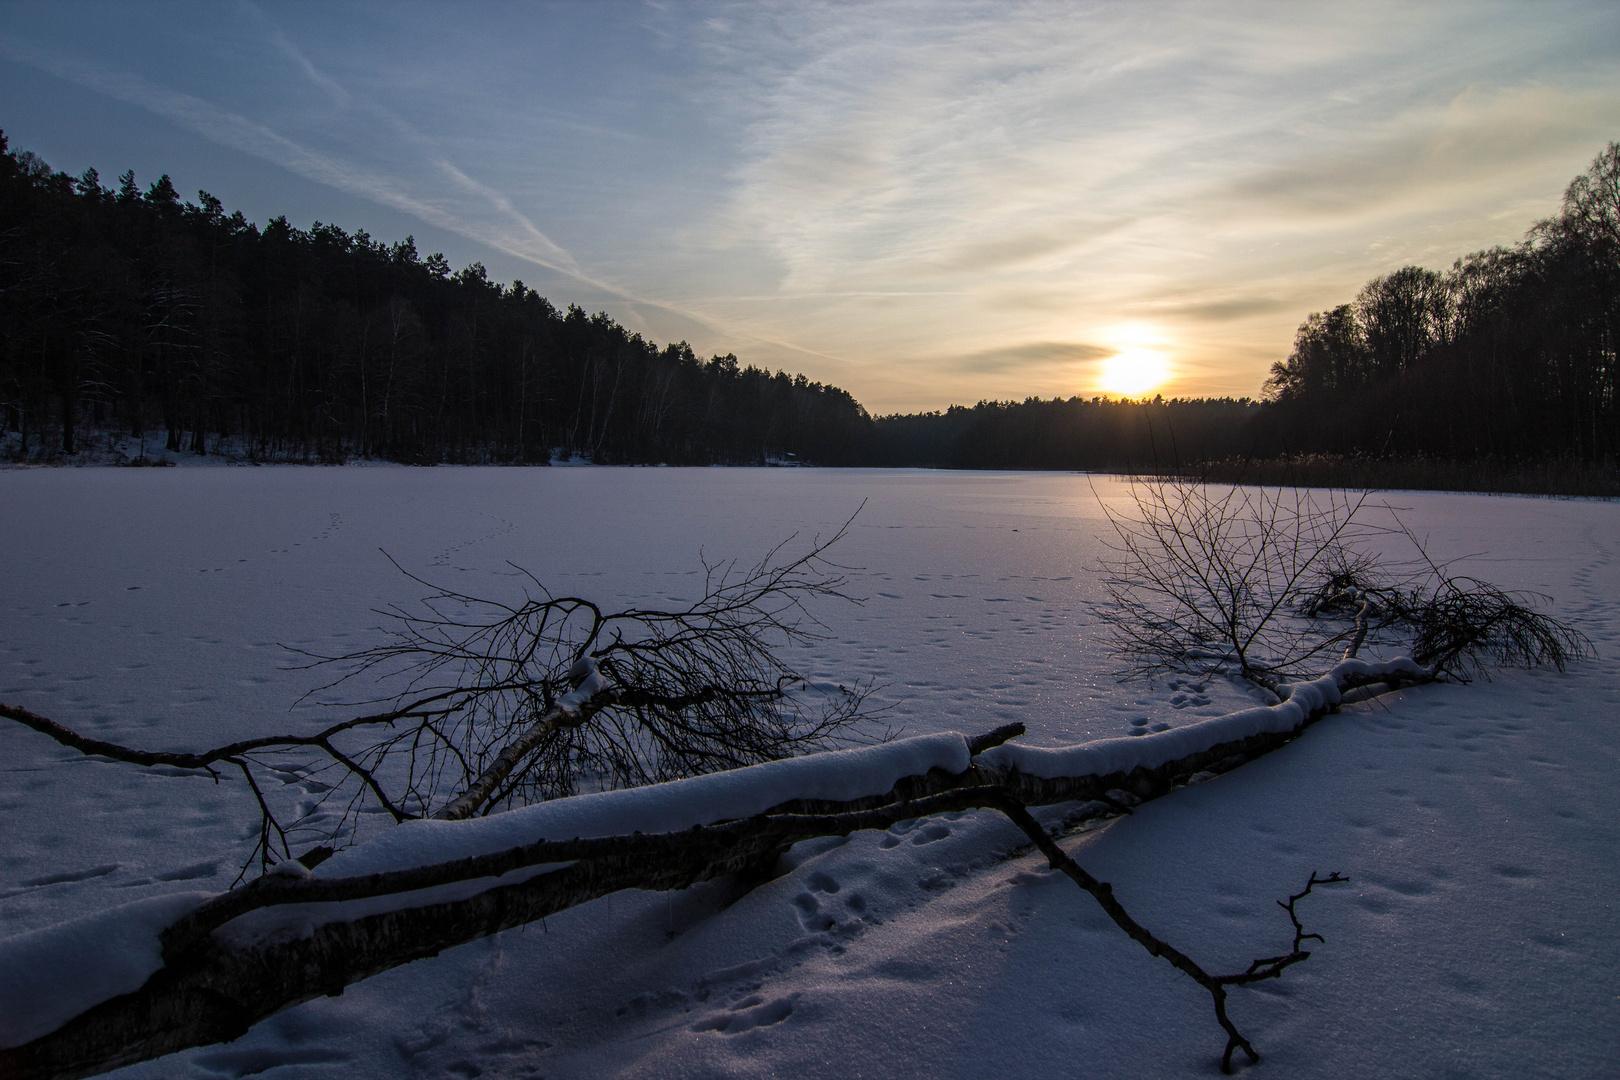 - Winterstimmung am Hungersee -